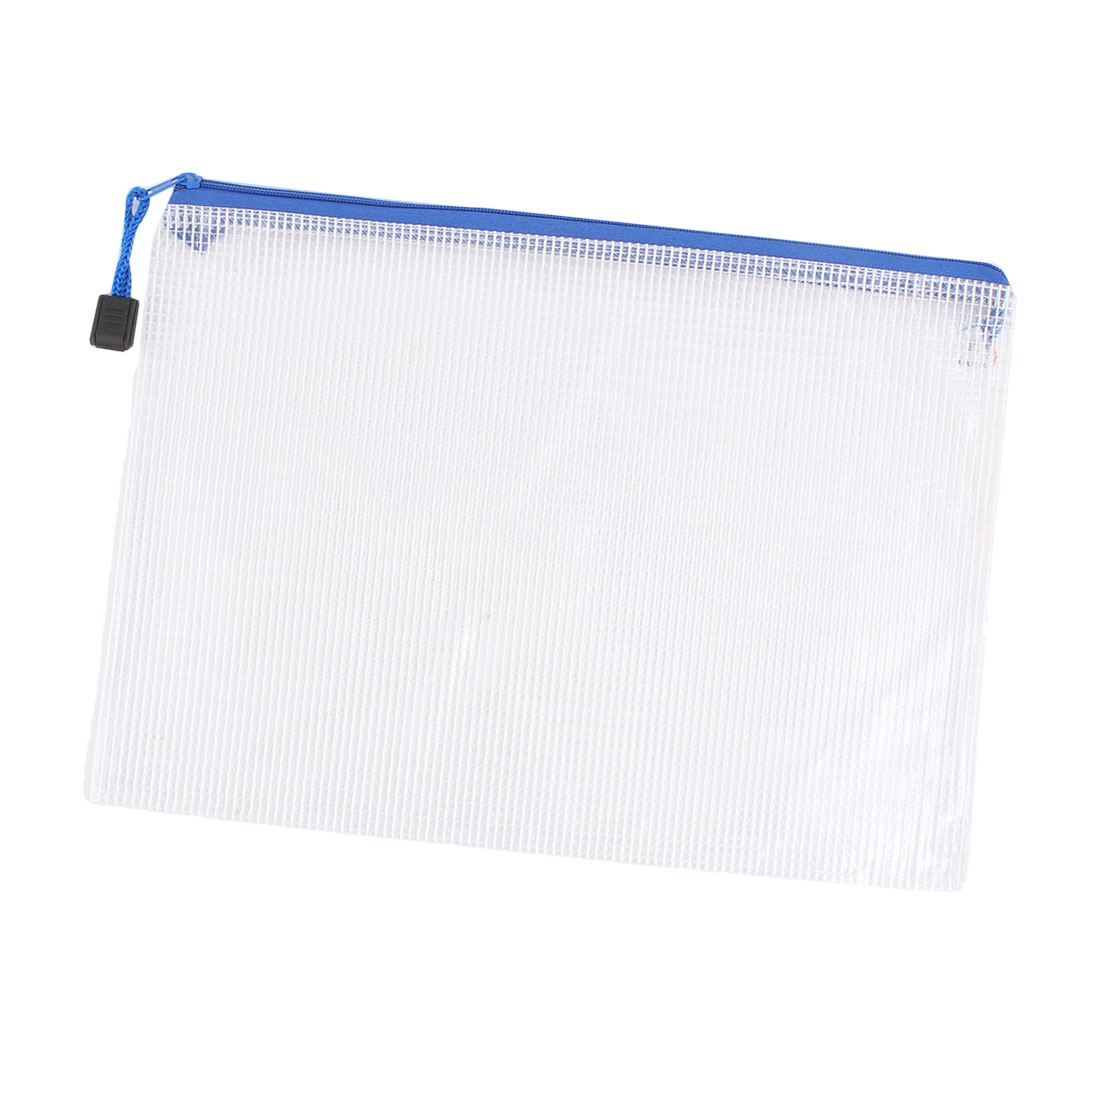 School Office A5 Magazine Document File Zippy Closure Folder Holder Bag White